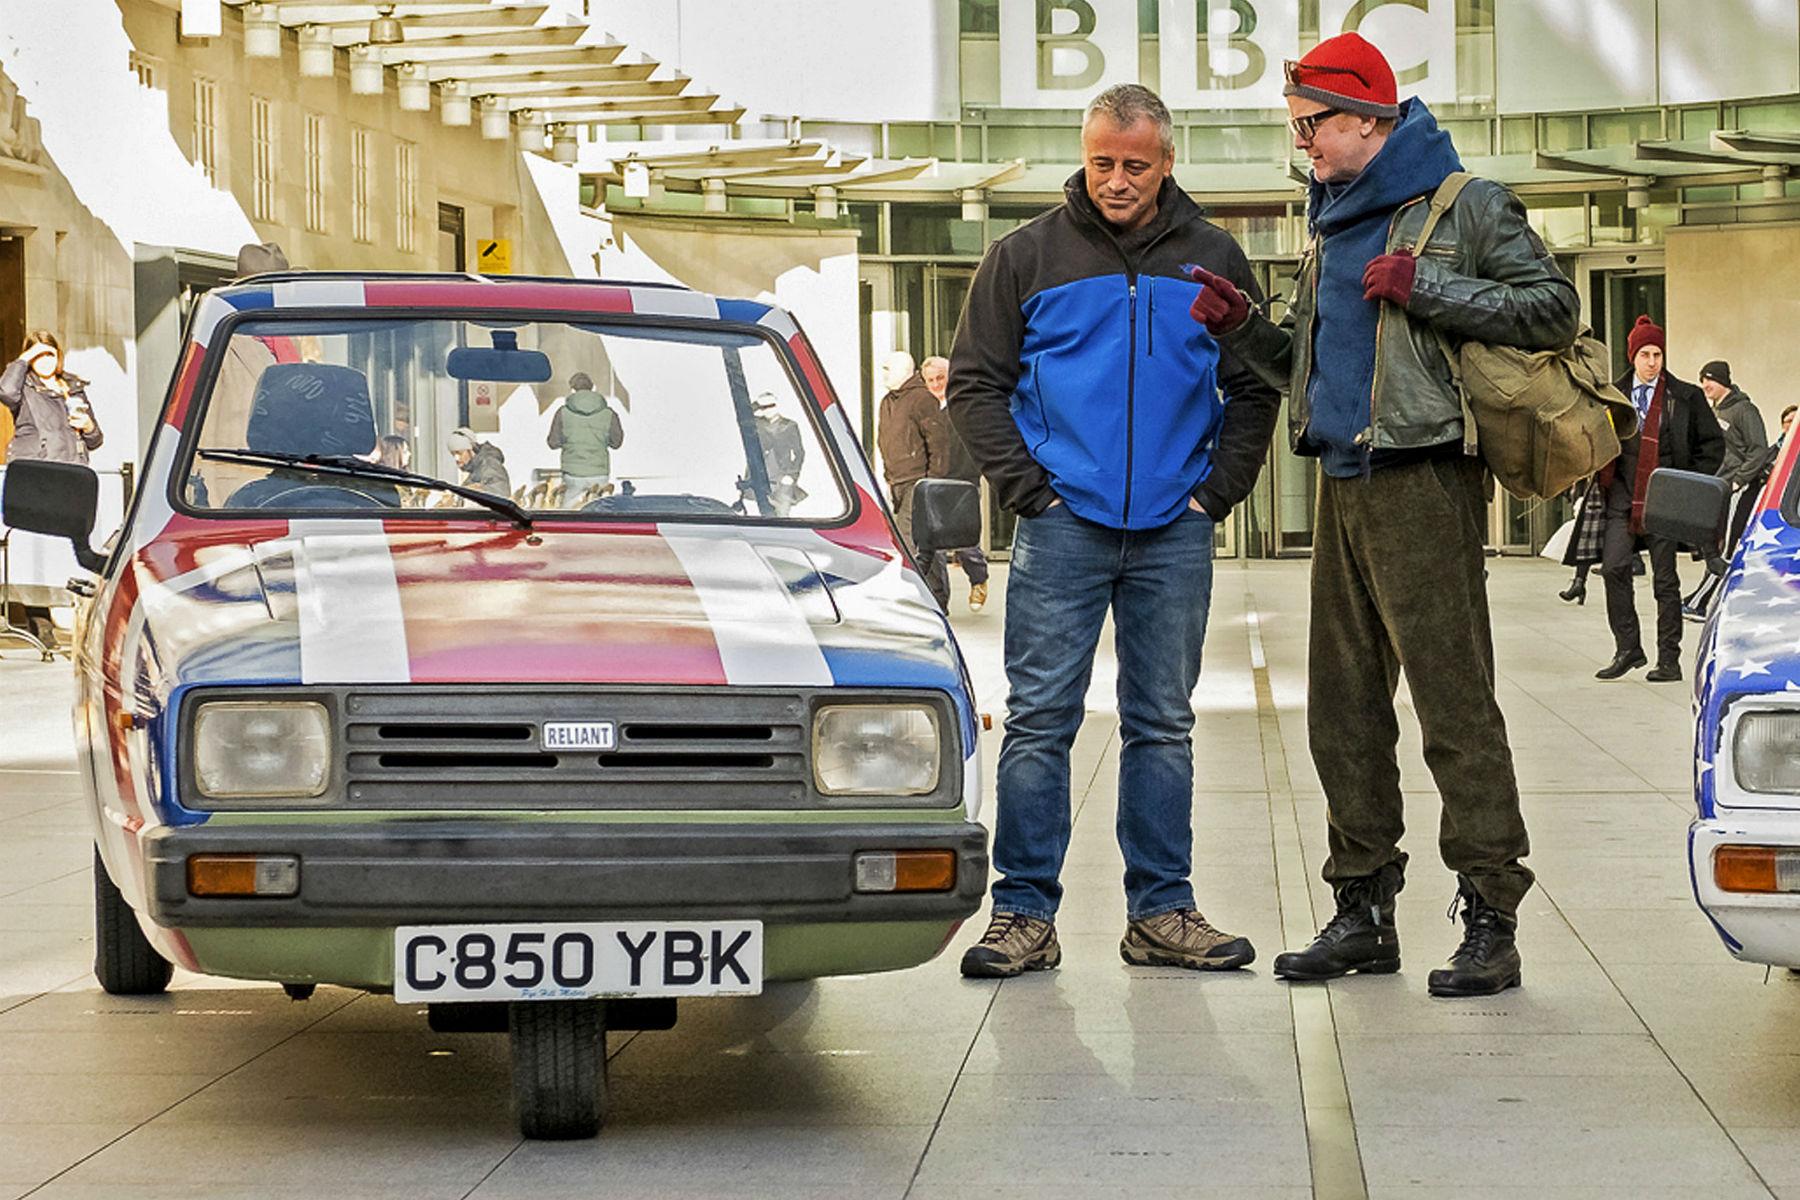 Confirmed: Matt LeBlanc will host the next series of Top Gear (without Chris Evans)